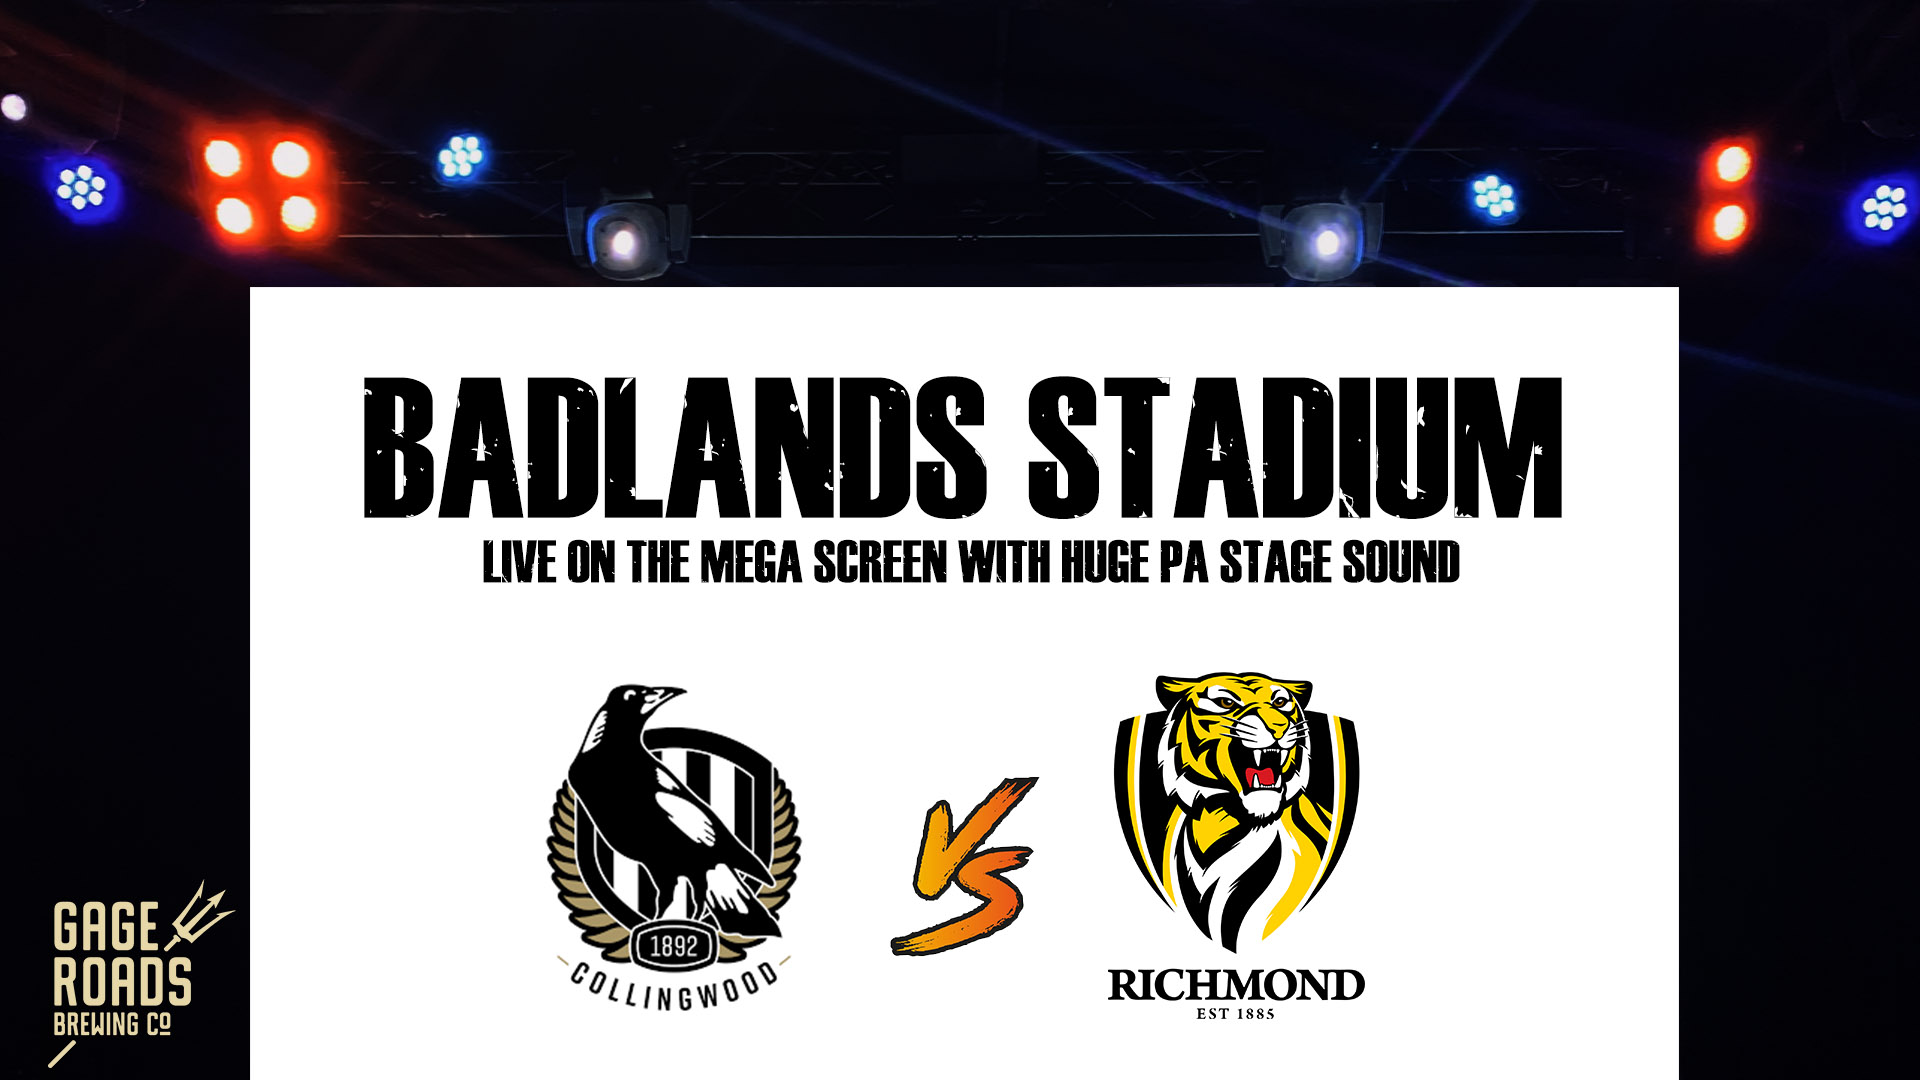 AFL Round 2/ Collingwood V Richmond